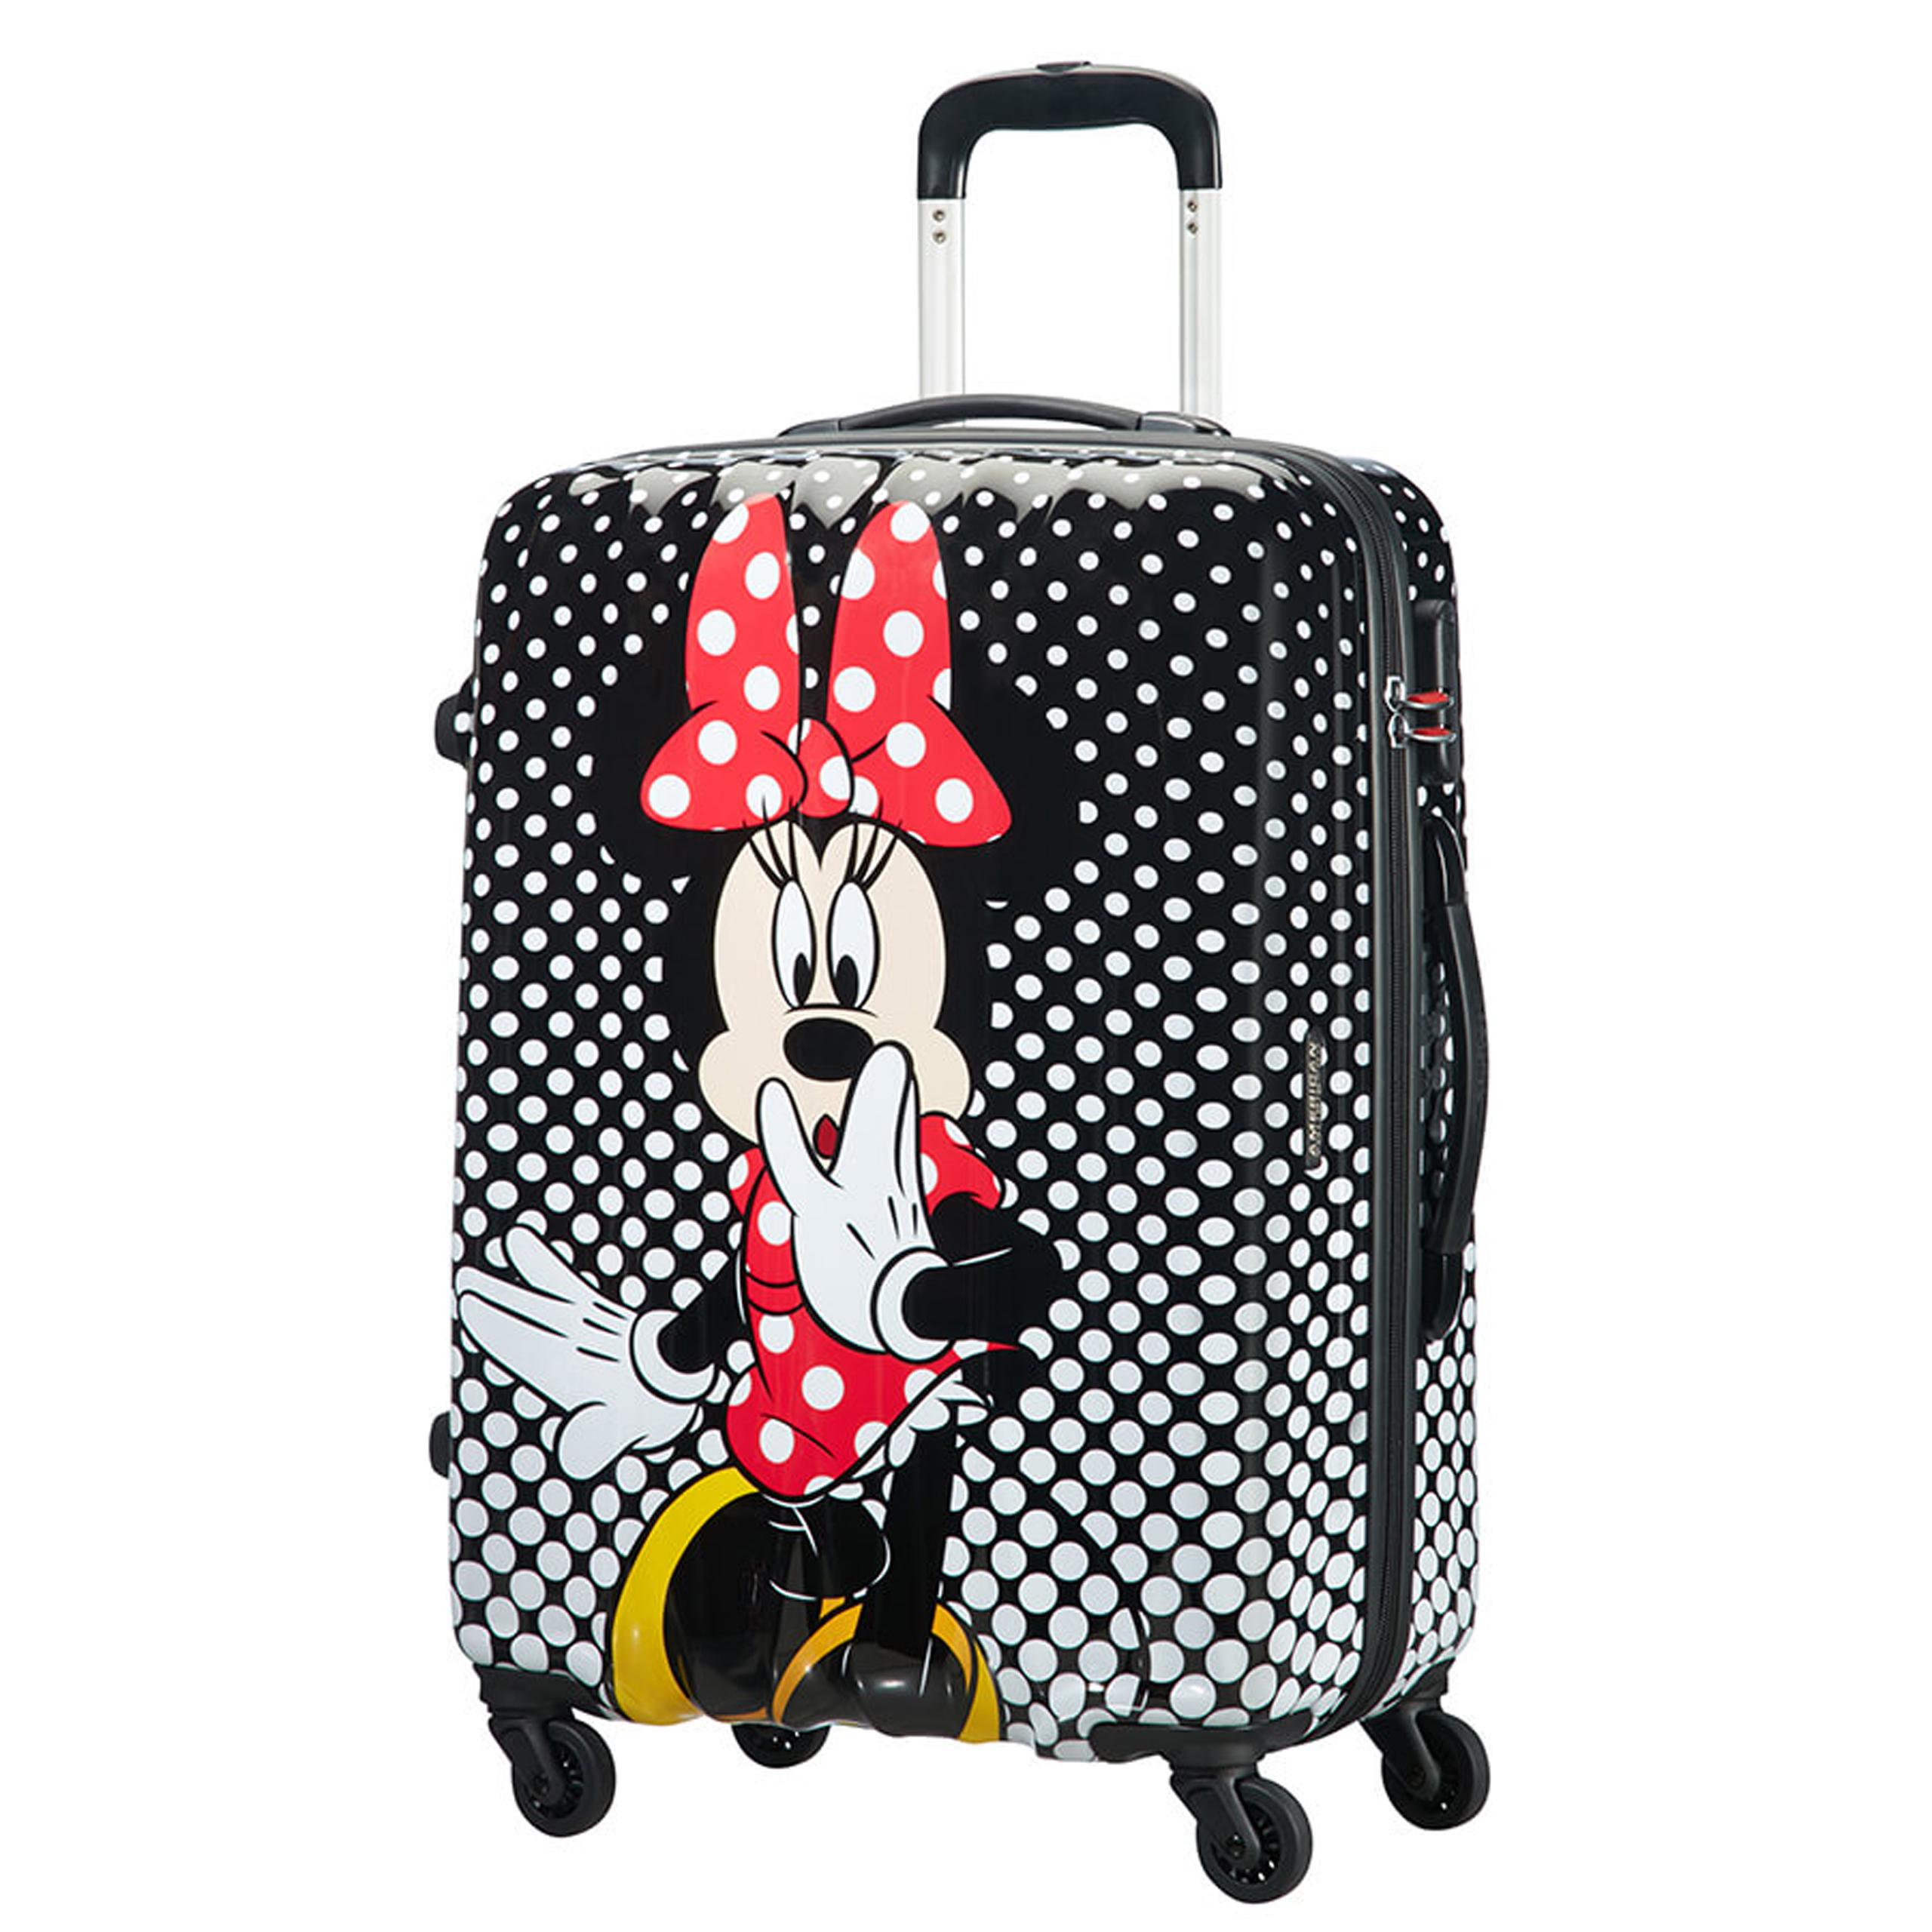 b31b83e930c3f Walizka American Tourister Disney Legends Minnie Mouse Polka Dot 65 cm 19C  19 019